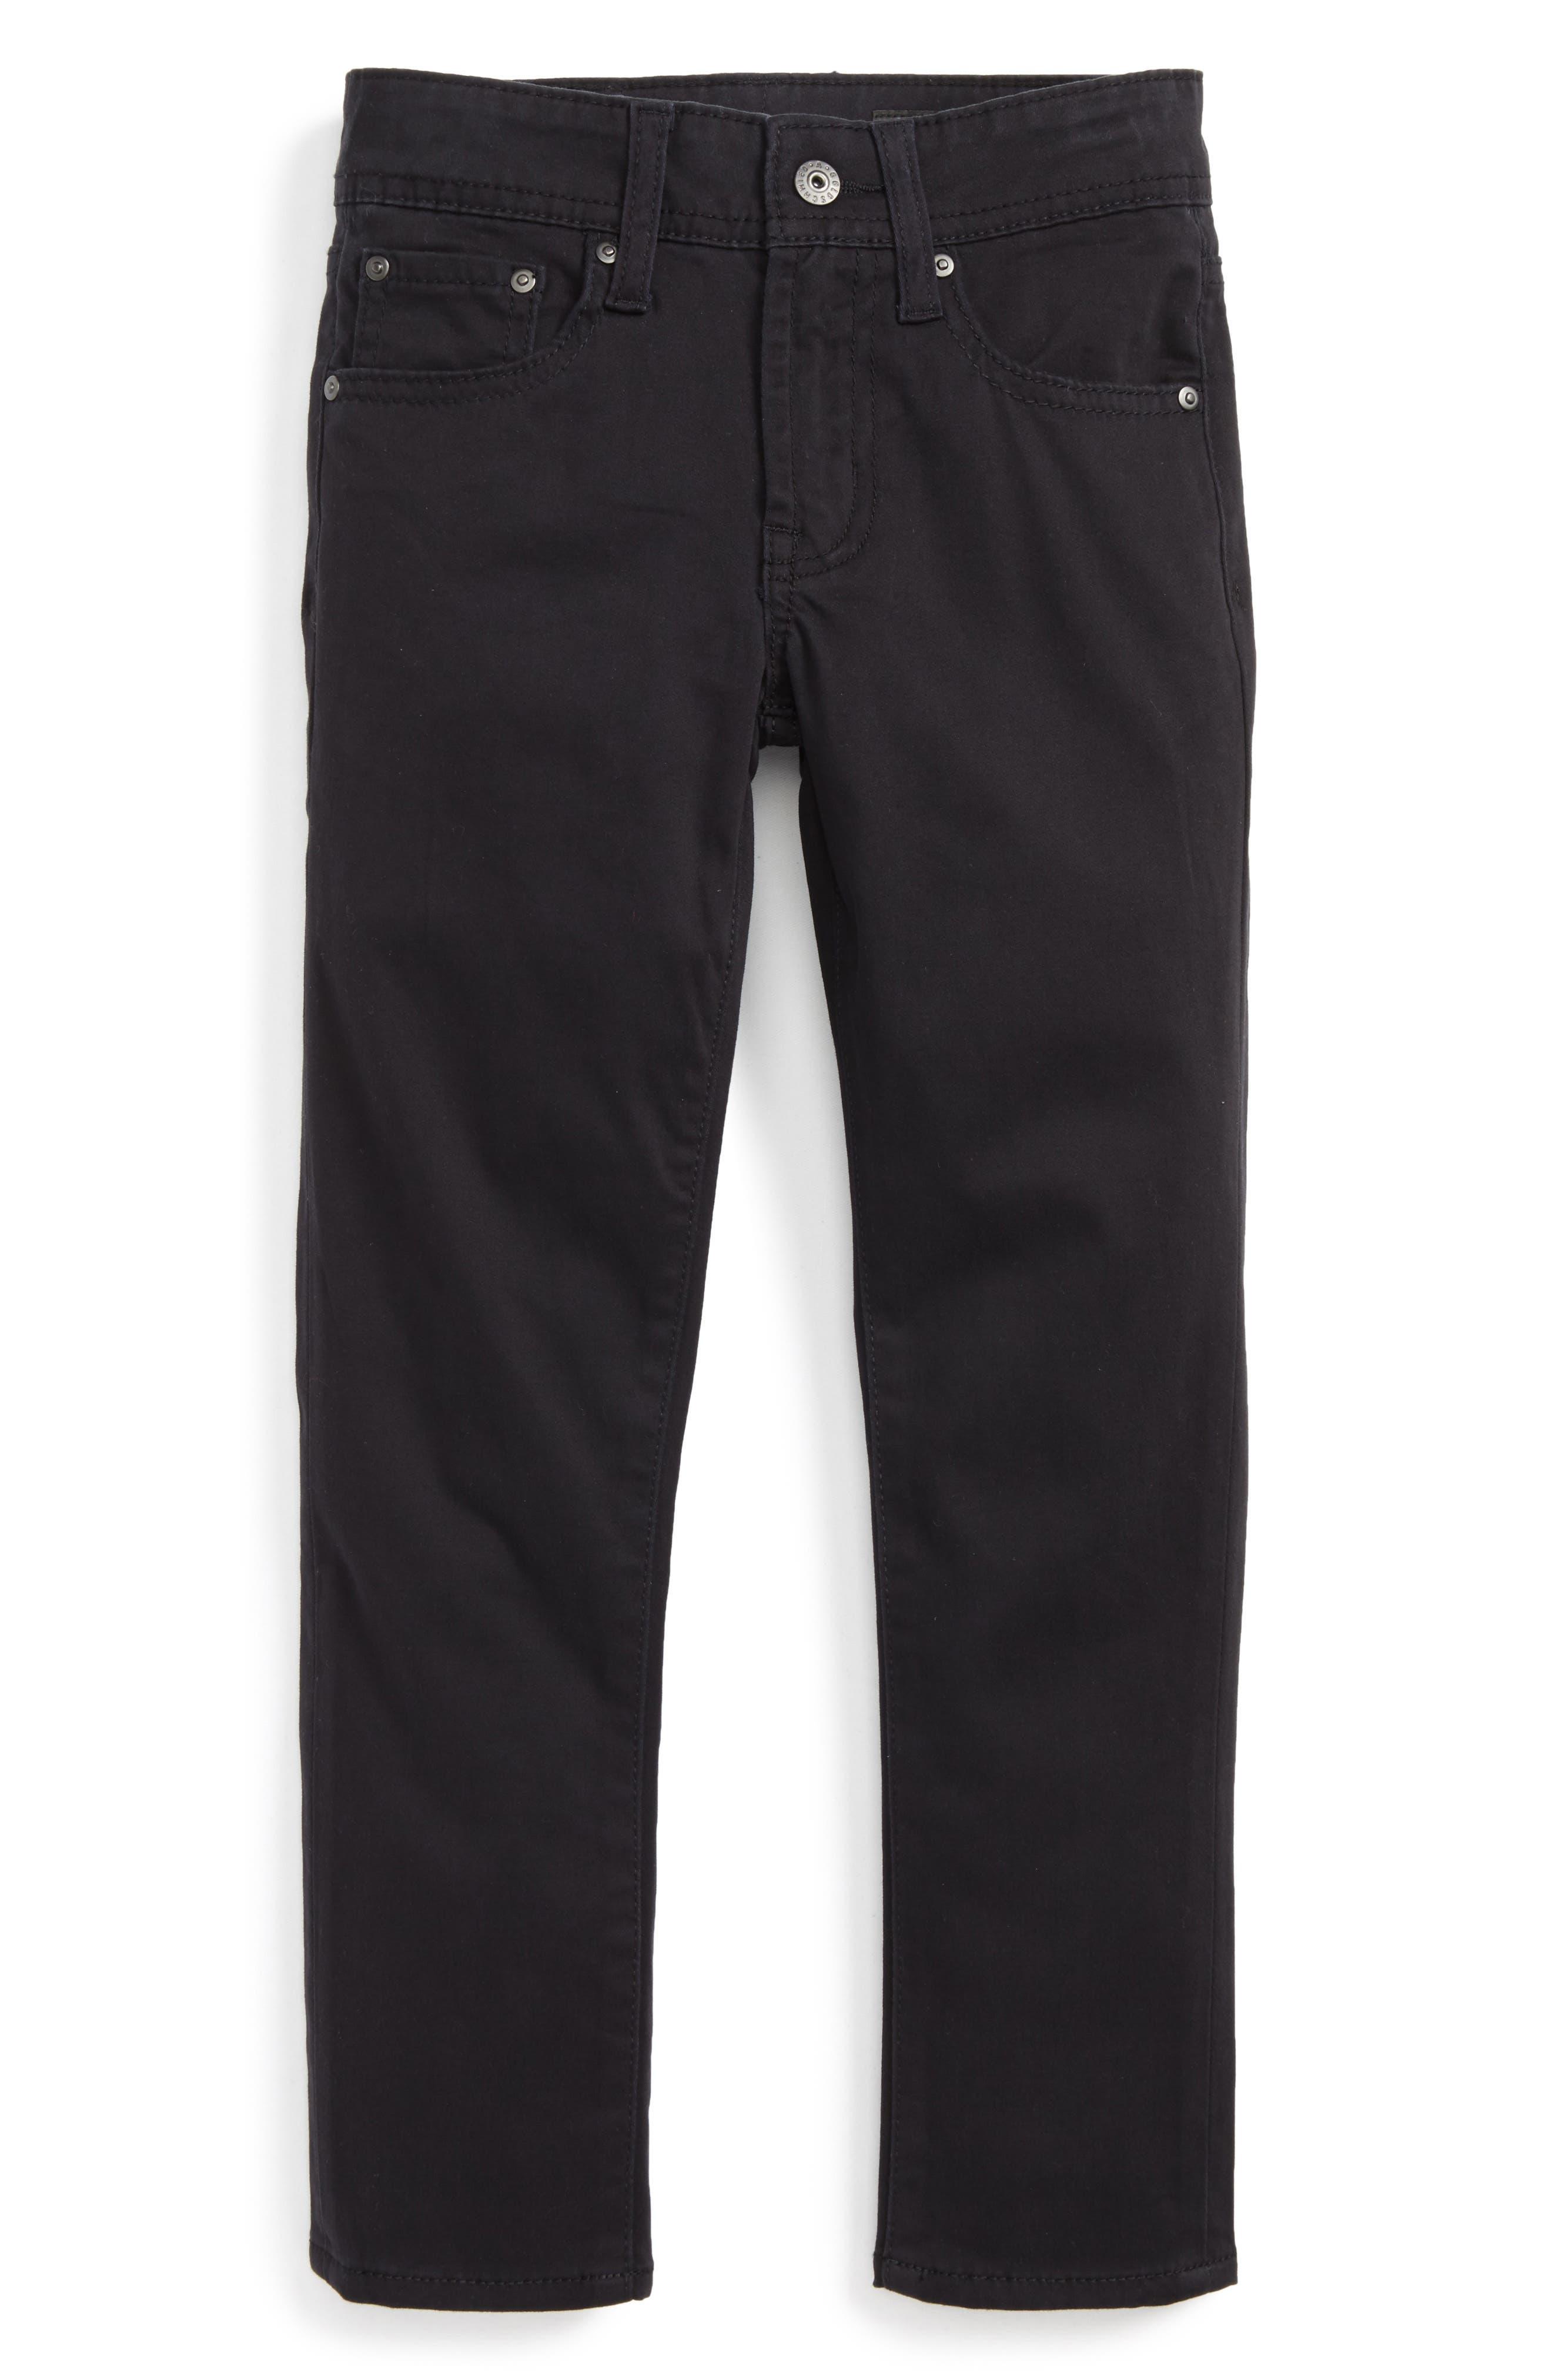 AG ADRIANO GOLDSCHMIED KIDS The Stryker Luxe Slim Straight Leg Jeans